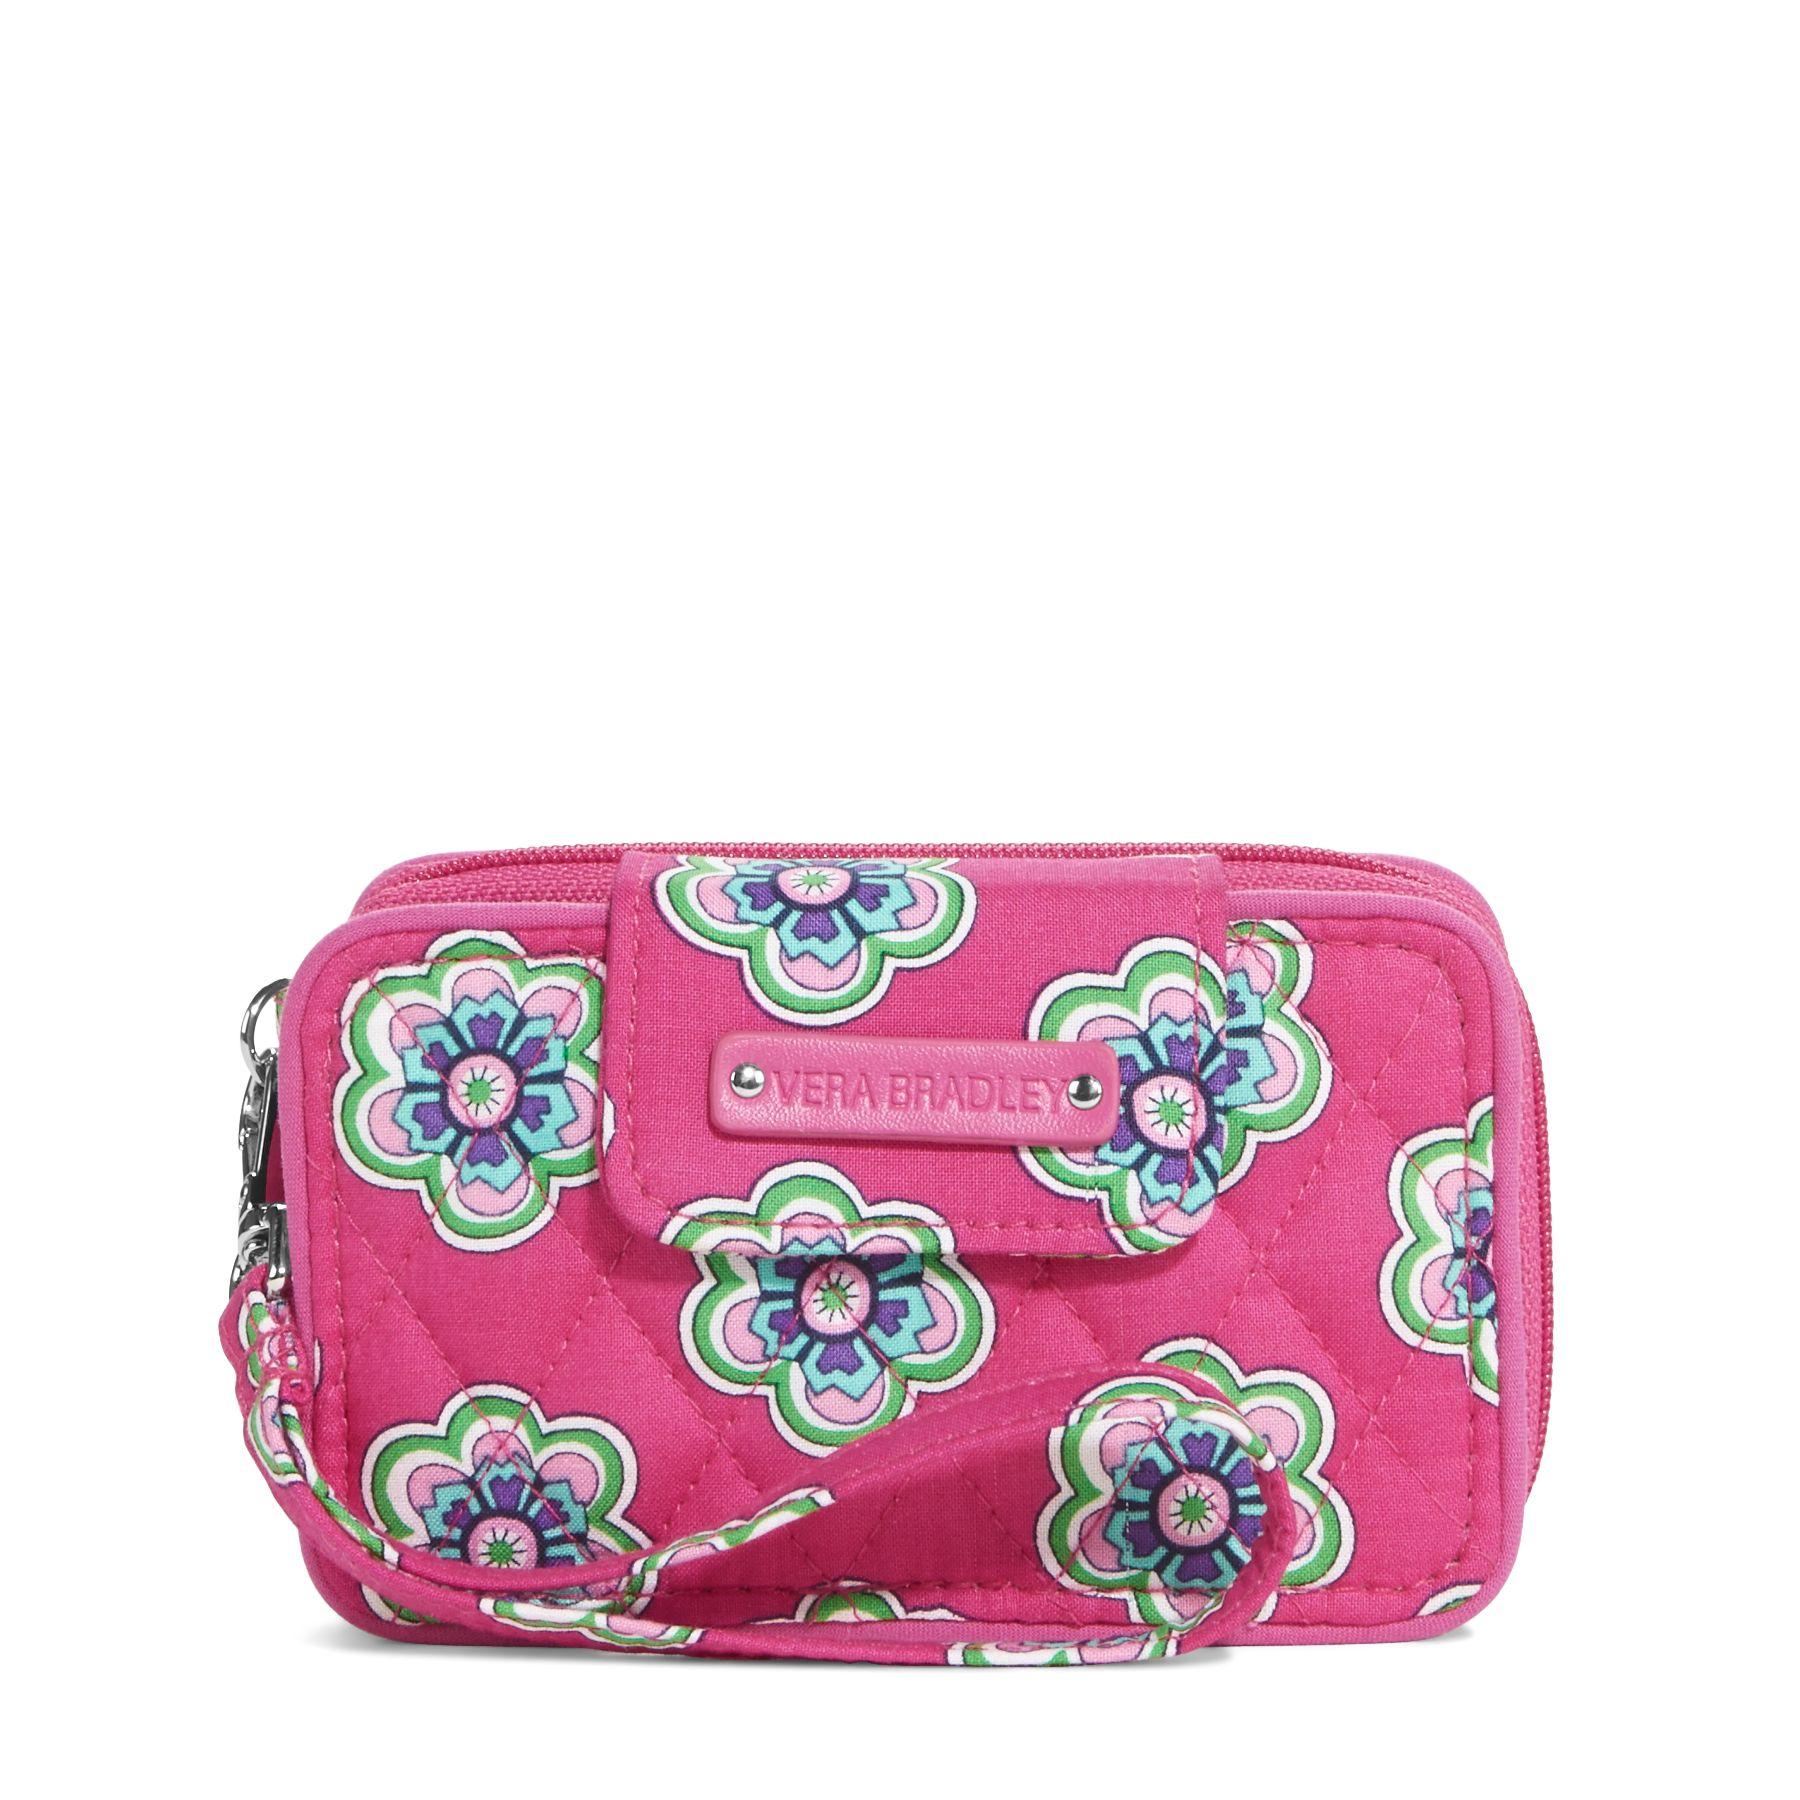 Vera Bradley Smartphone Wristlet 2.0 in Pink Swirls Flowers